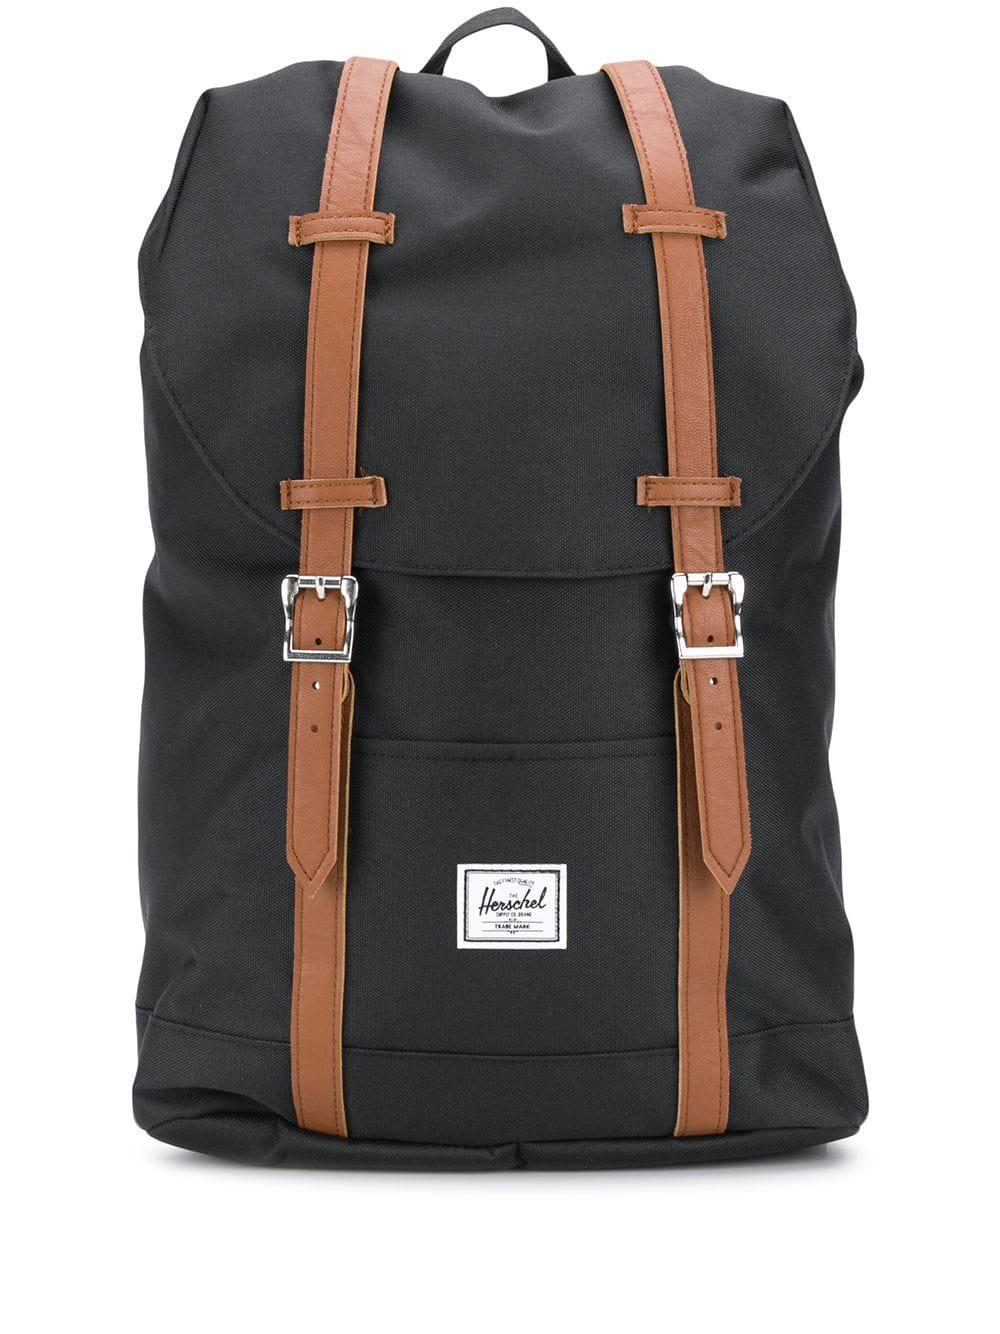 2c153fb93bd84 Herschel Supply Co. Retreat Backpack - Black